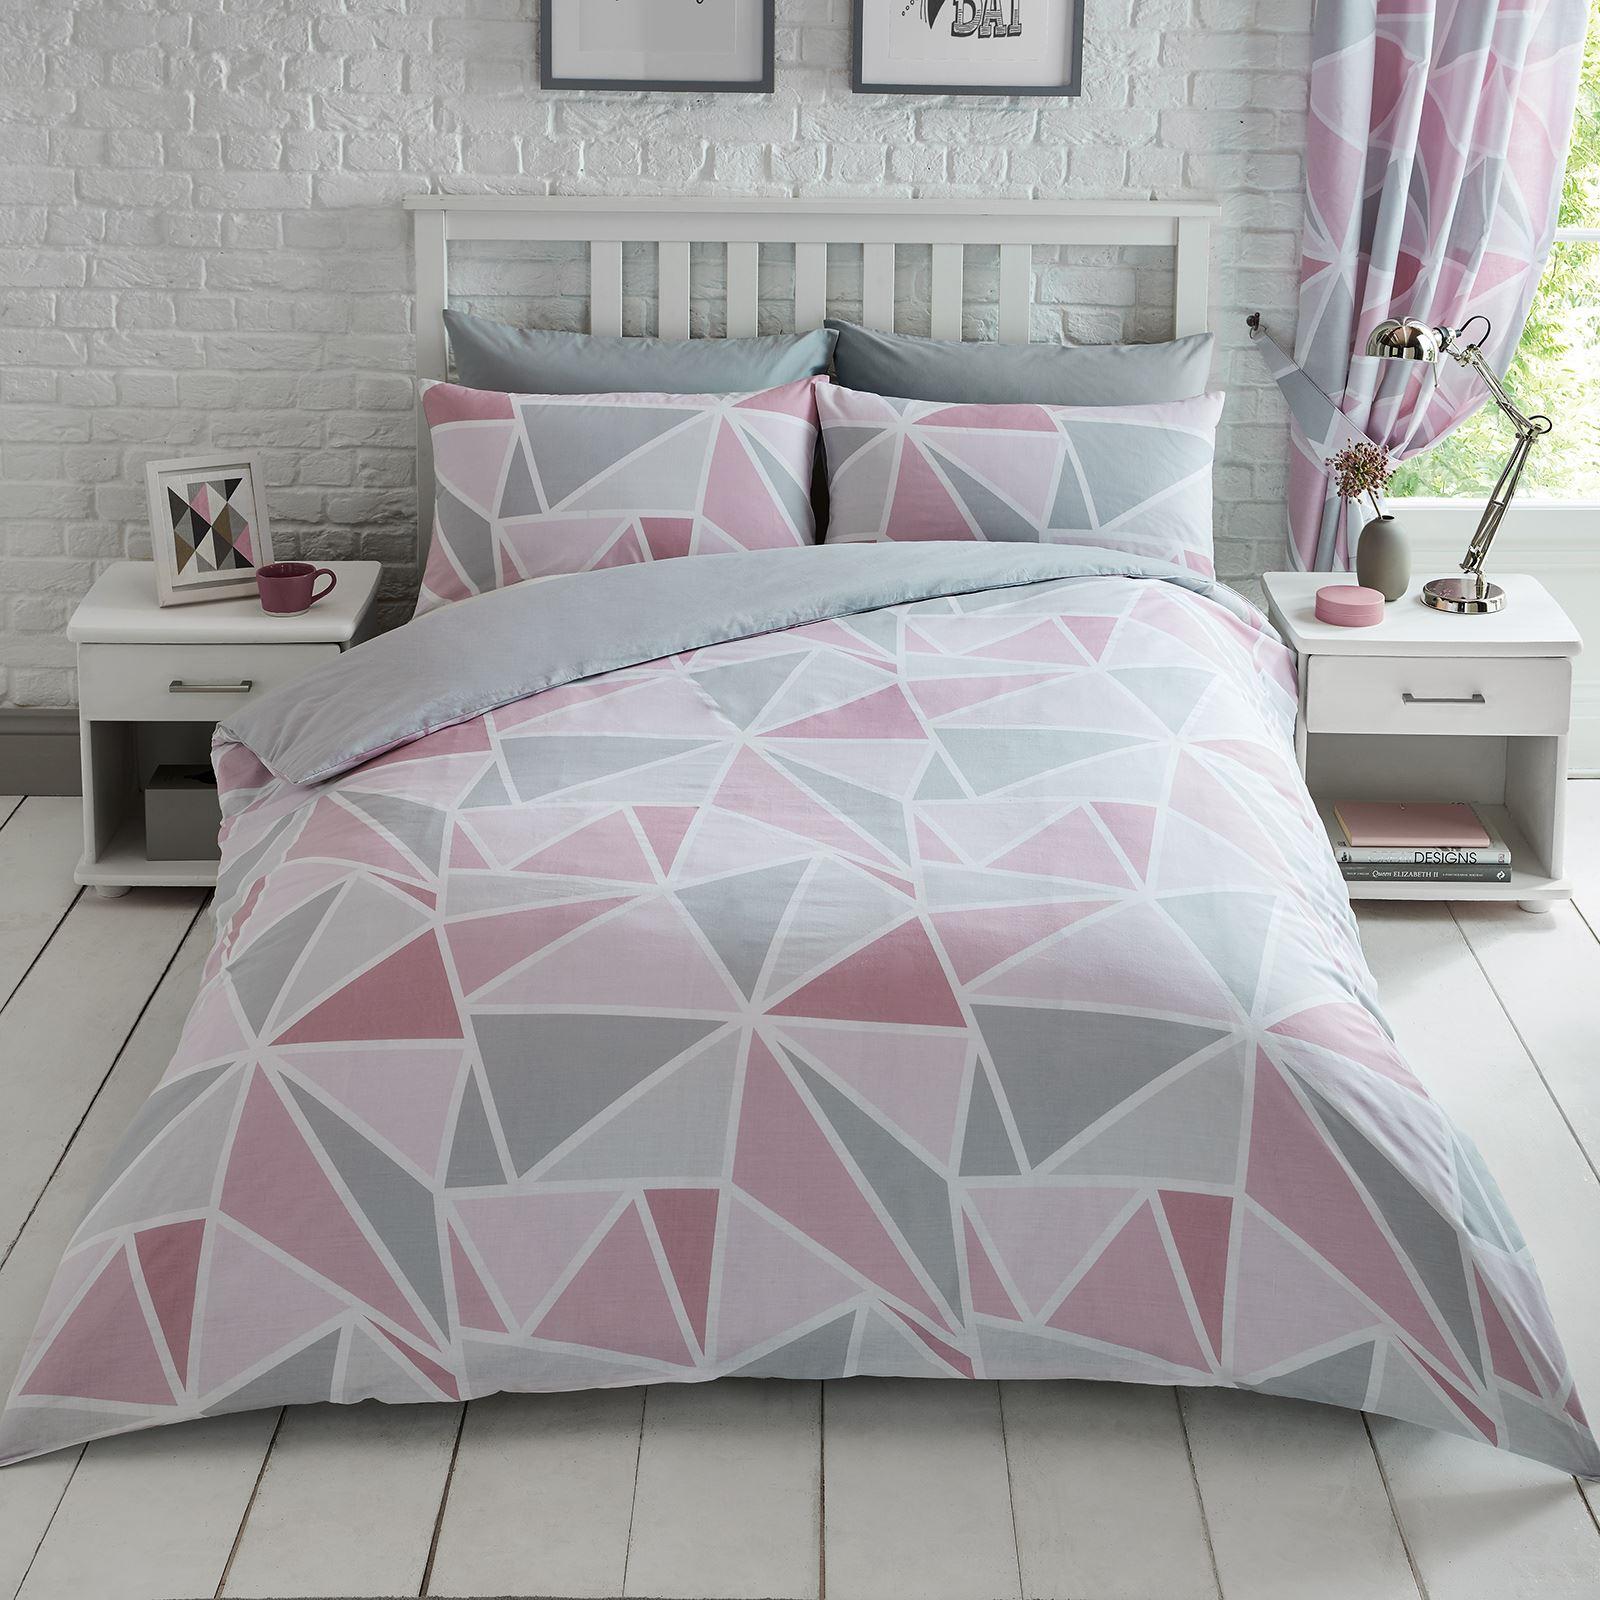 Metro Triangle King Duvet Cover Set Pink Grey Modern